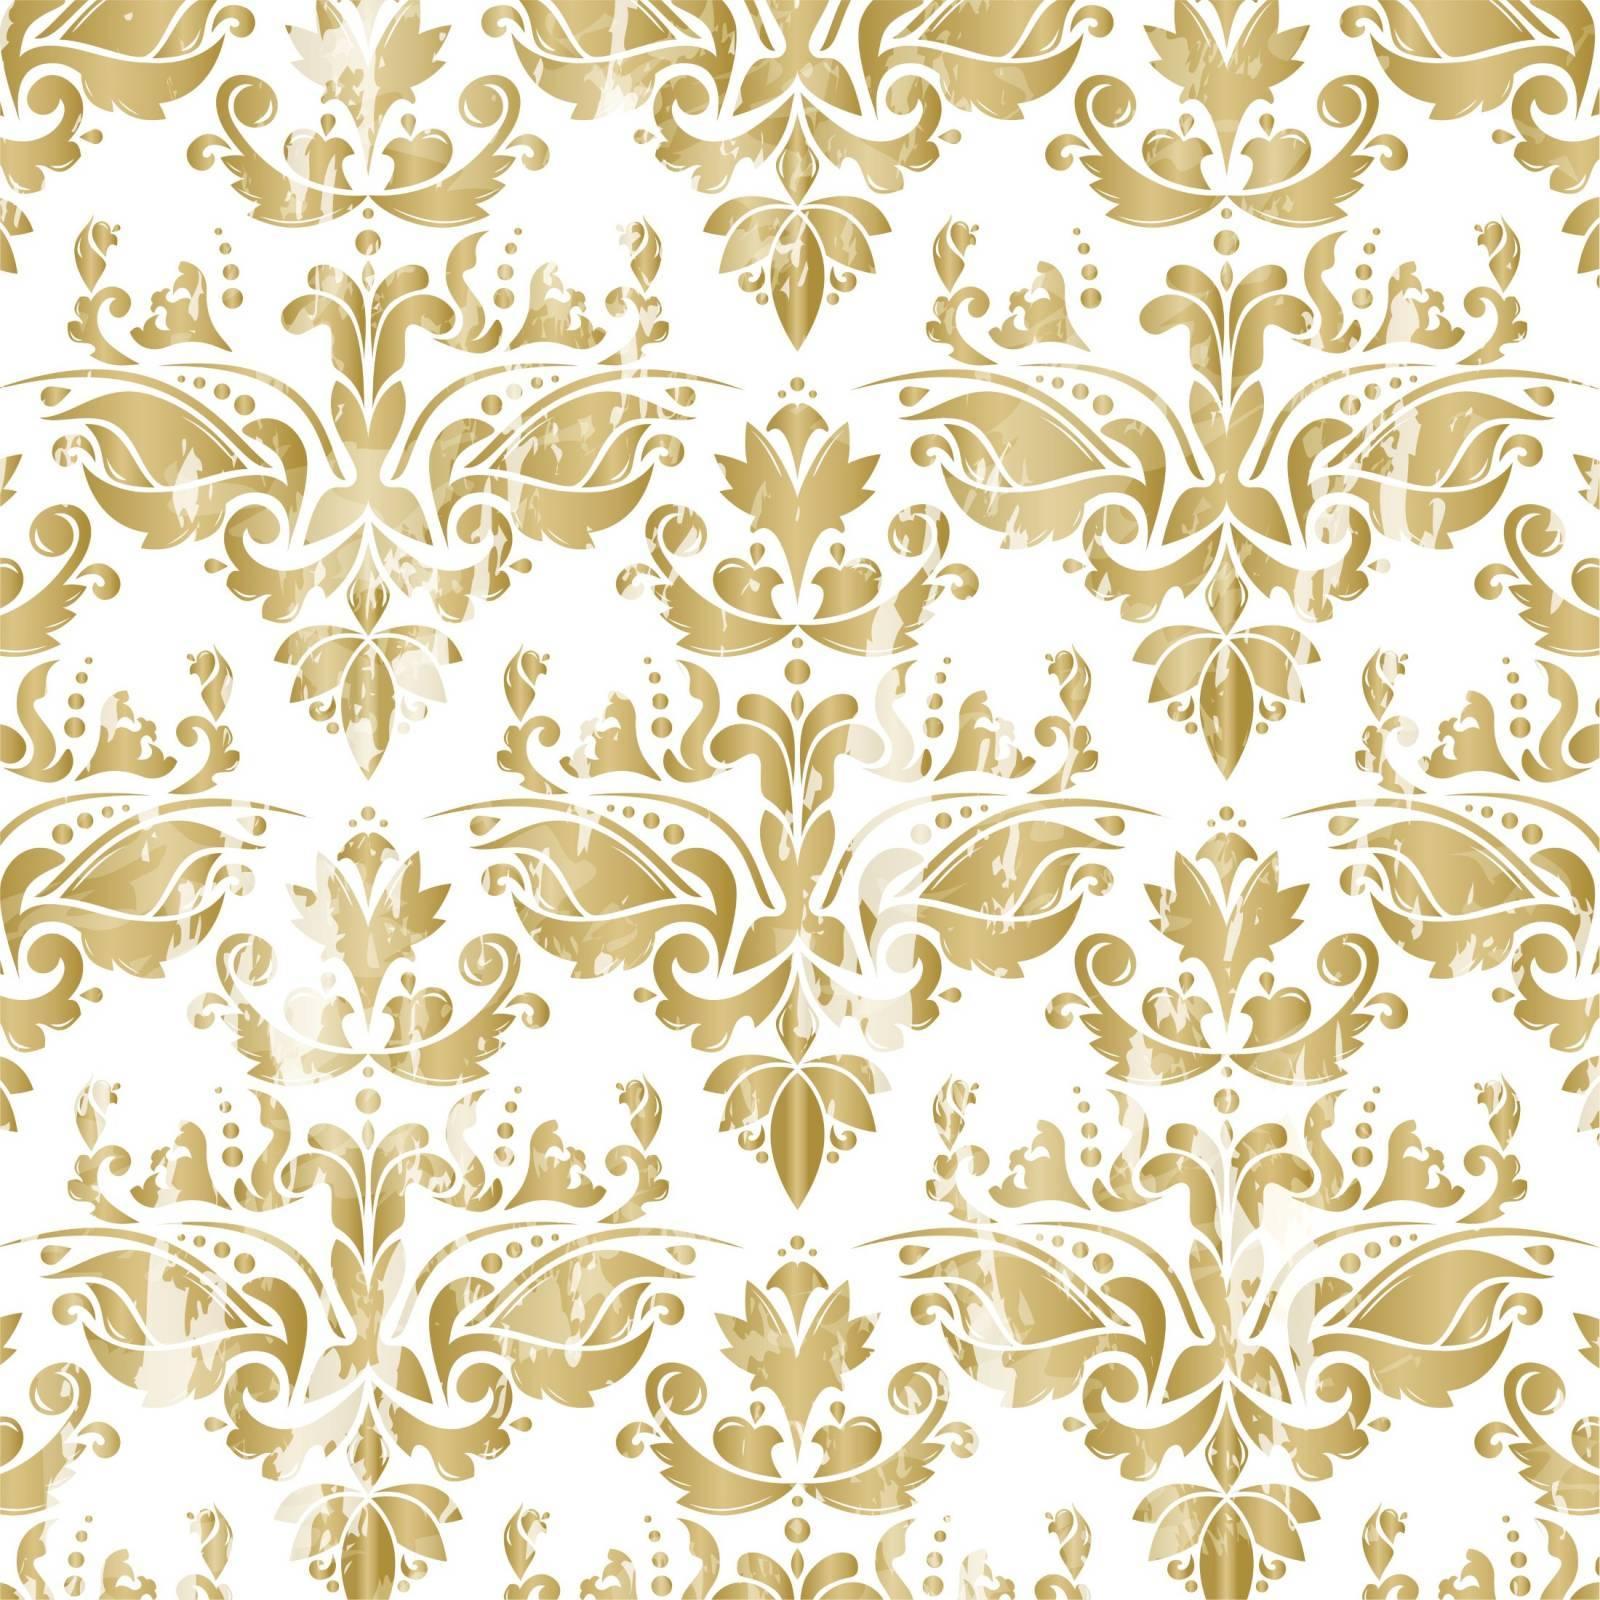 Papel de parede adesivo arabesco dourado e branco redecorei for Papel de pared dorado